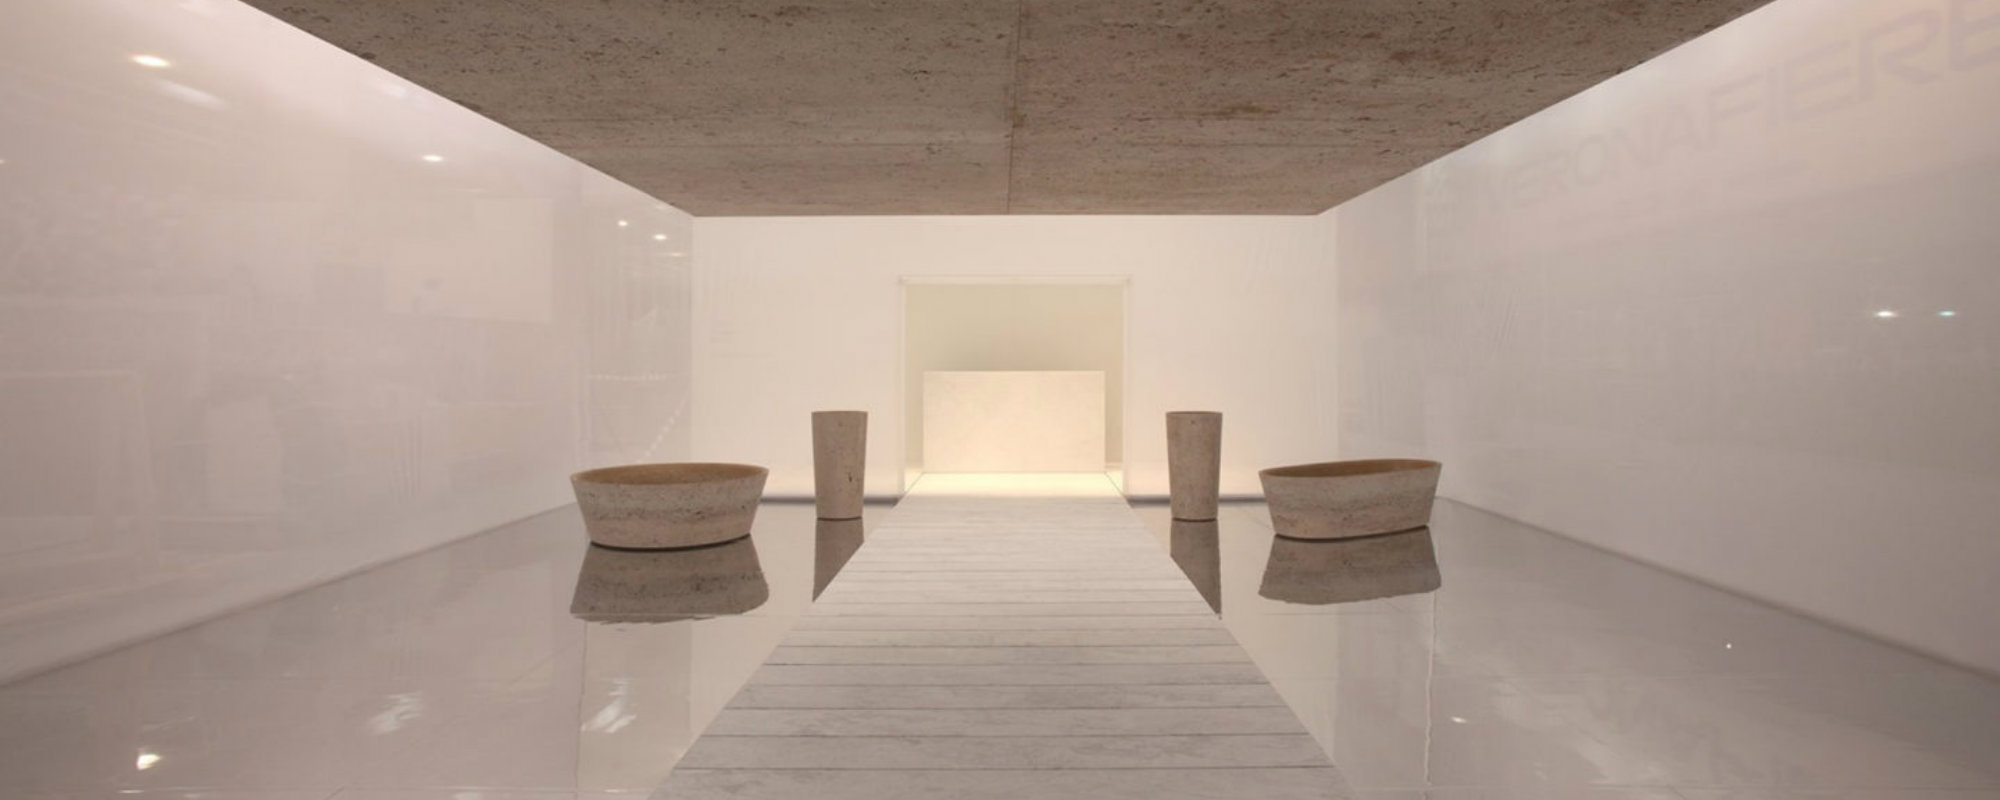 Alberto Campo Baeza: Empresa de Arquitectura de lujo para proyectos alberto campo baeza Alberto Campo Baeza: Empresa de Arquitectura de lujo para proyectos Featured 3